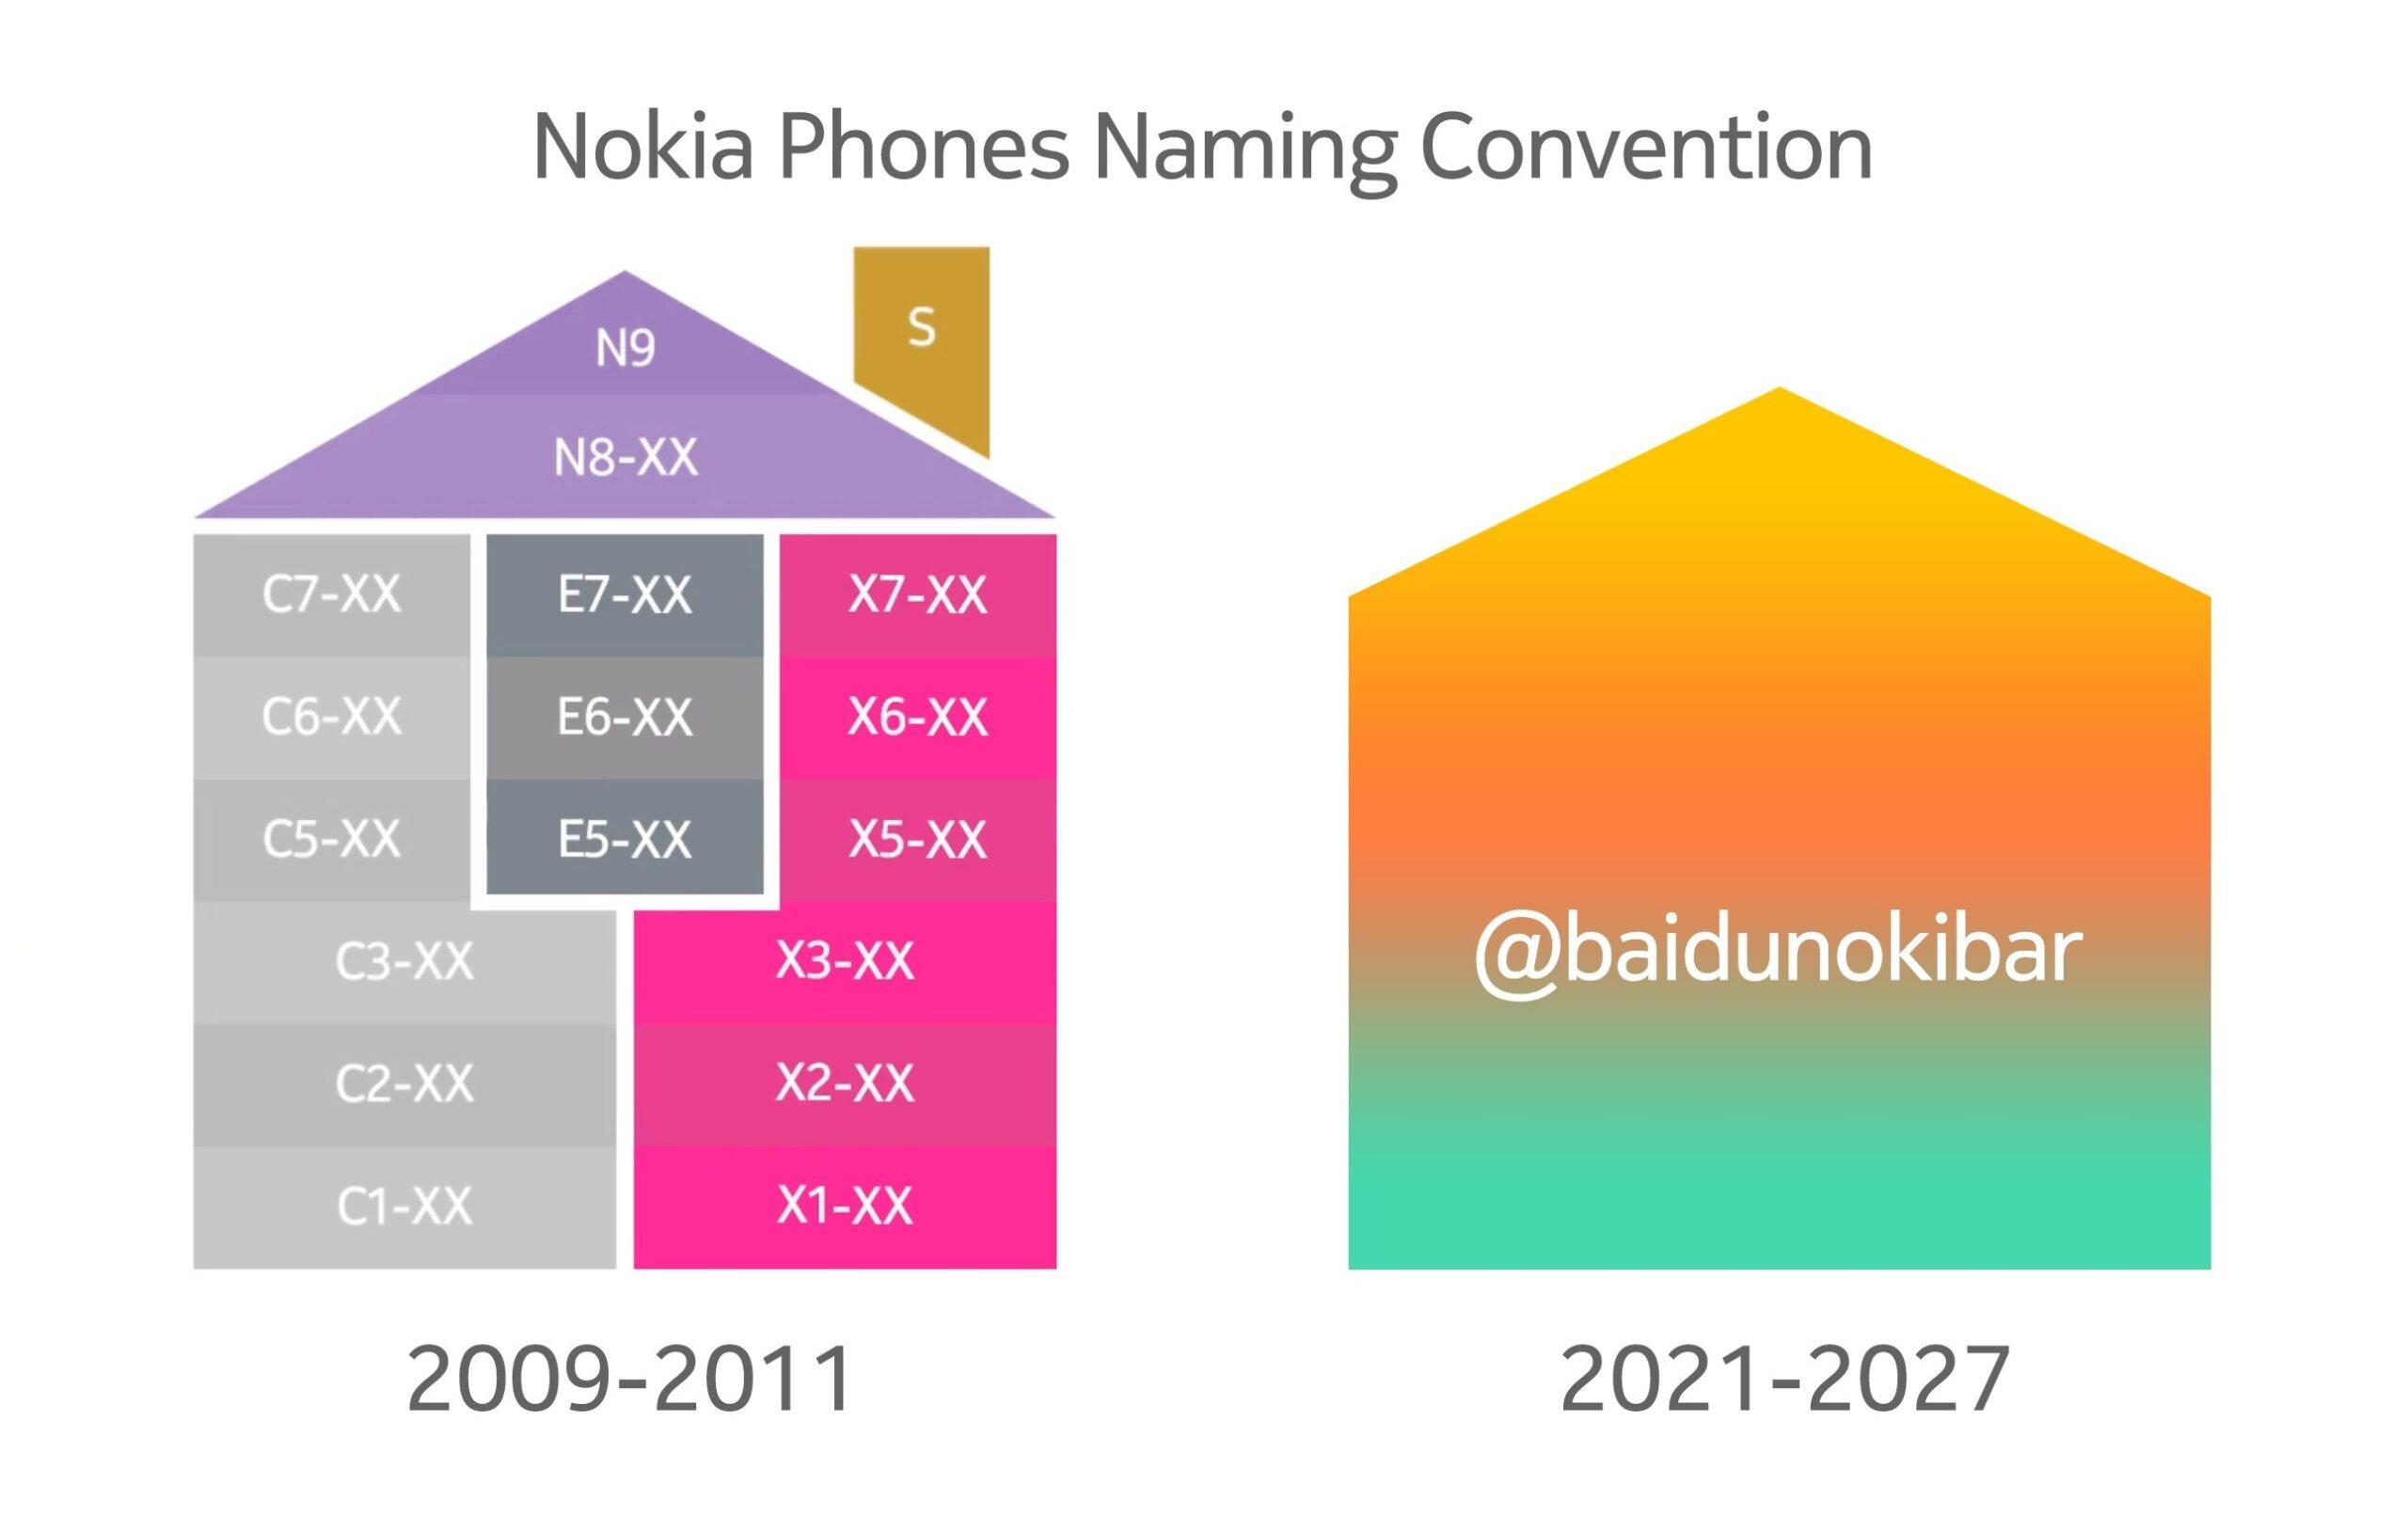 Nokia phones new naming scheme 2021